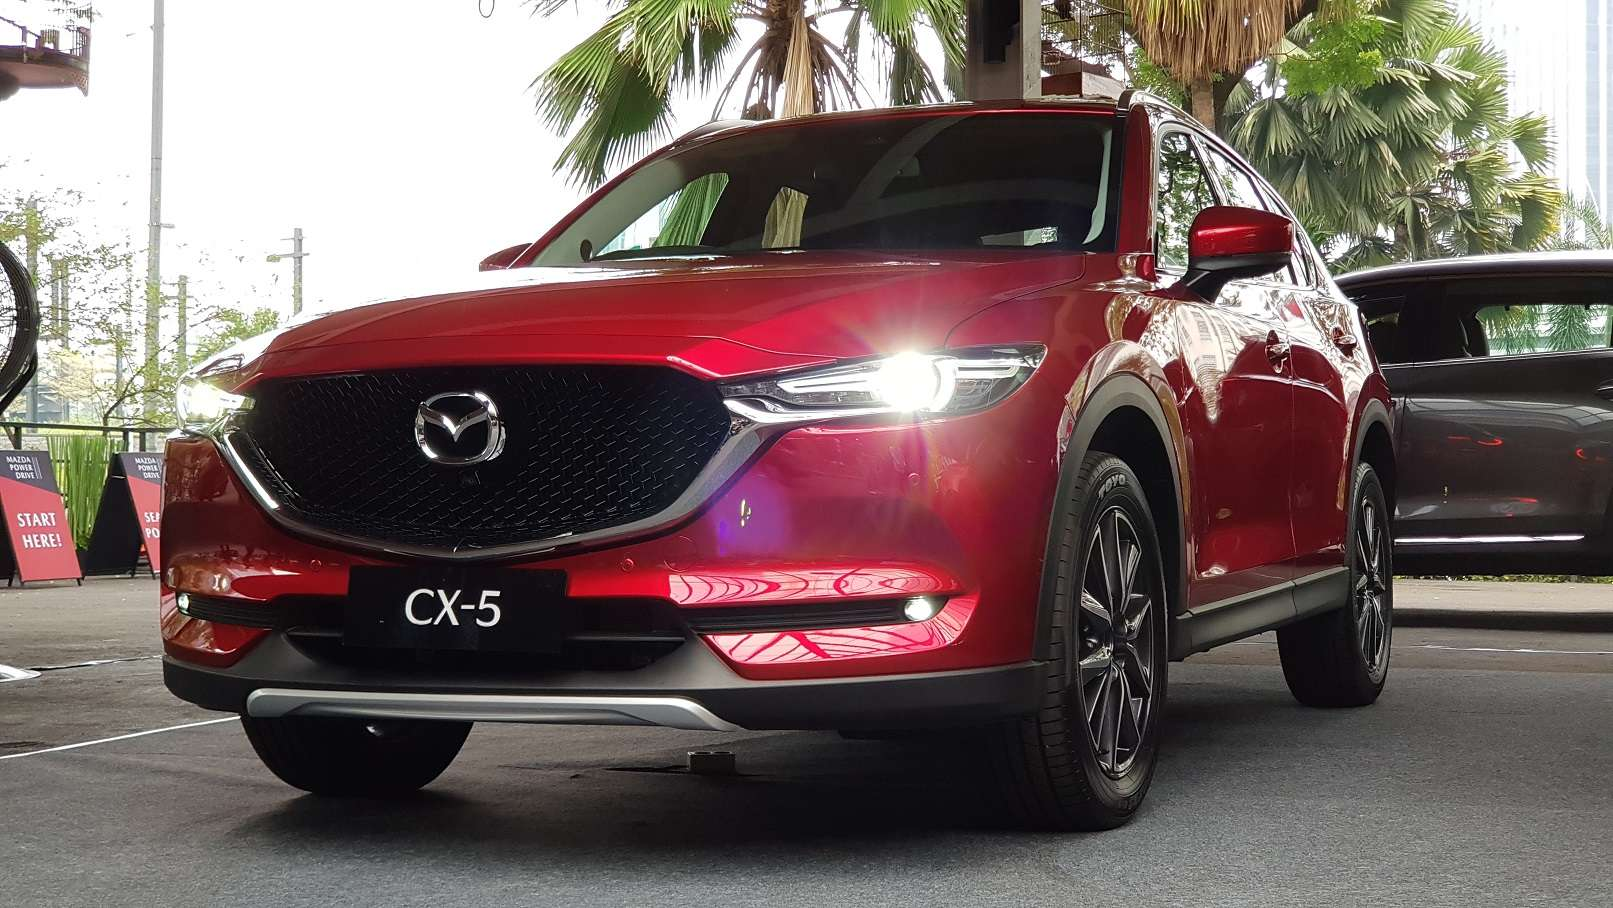 Kelebihan Kekurangan Mazda Cx 5 Olx Top Model Tahun Ini